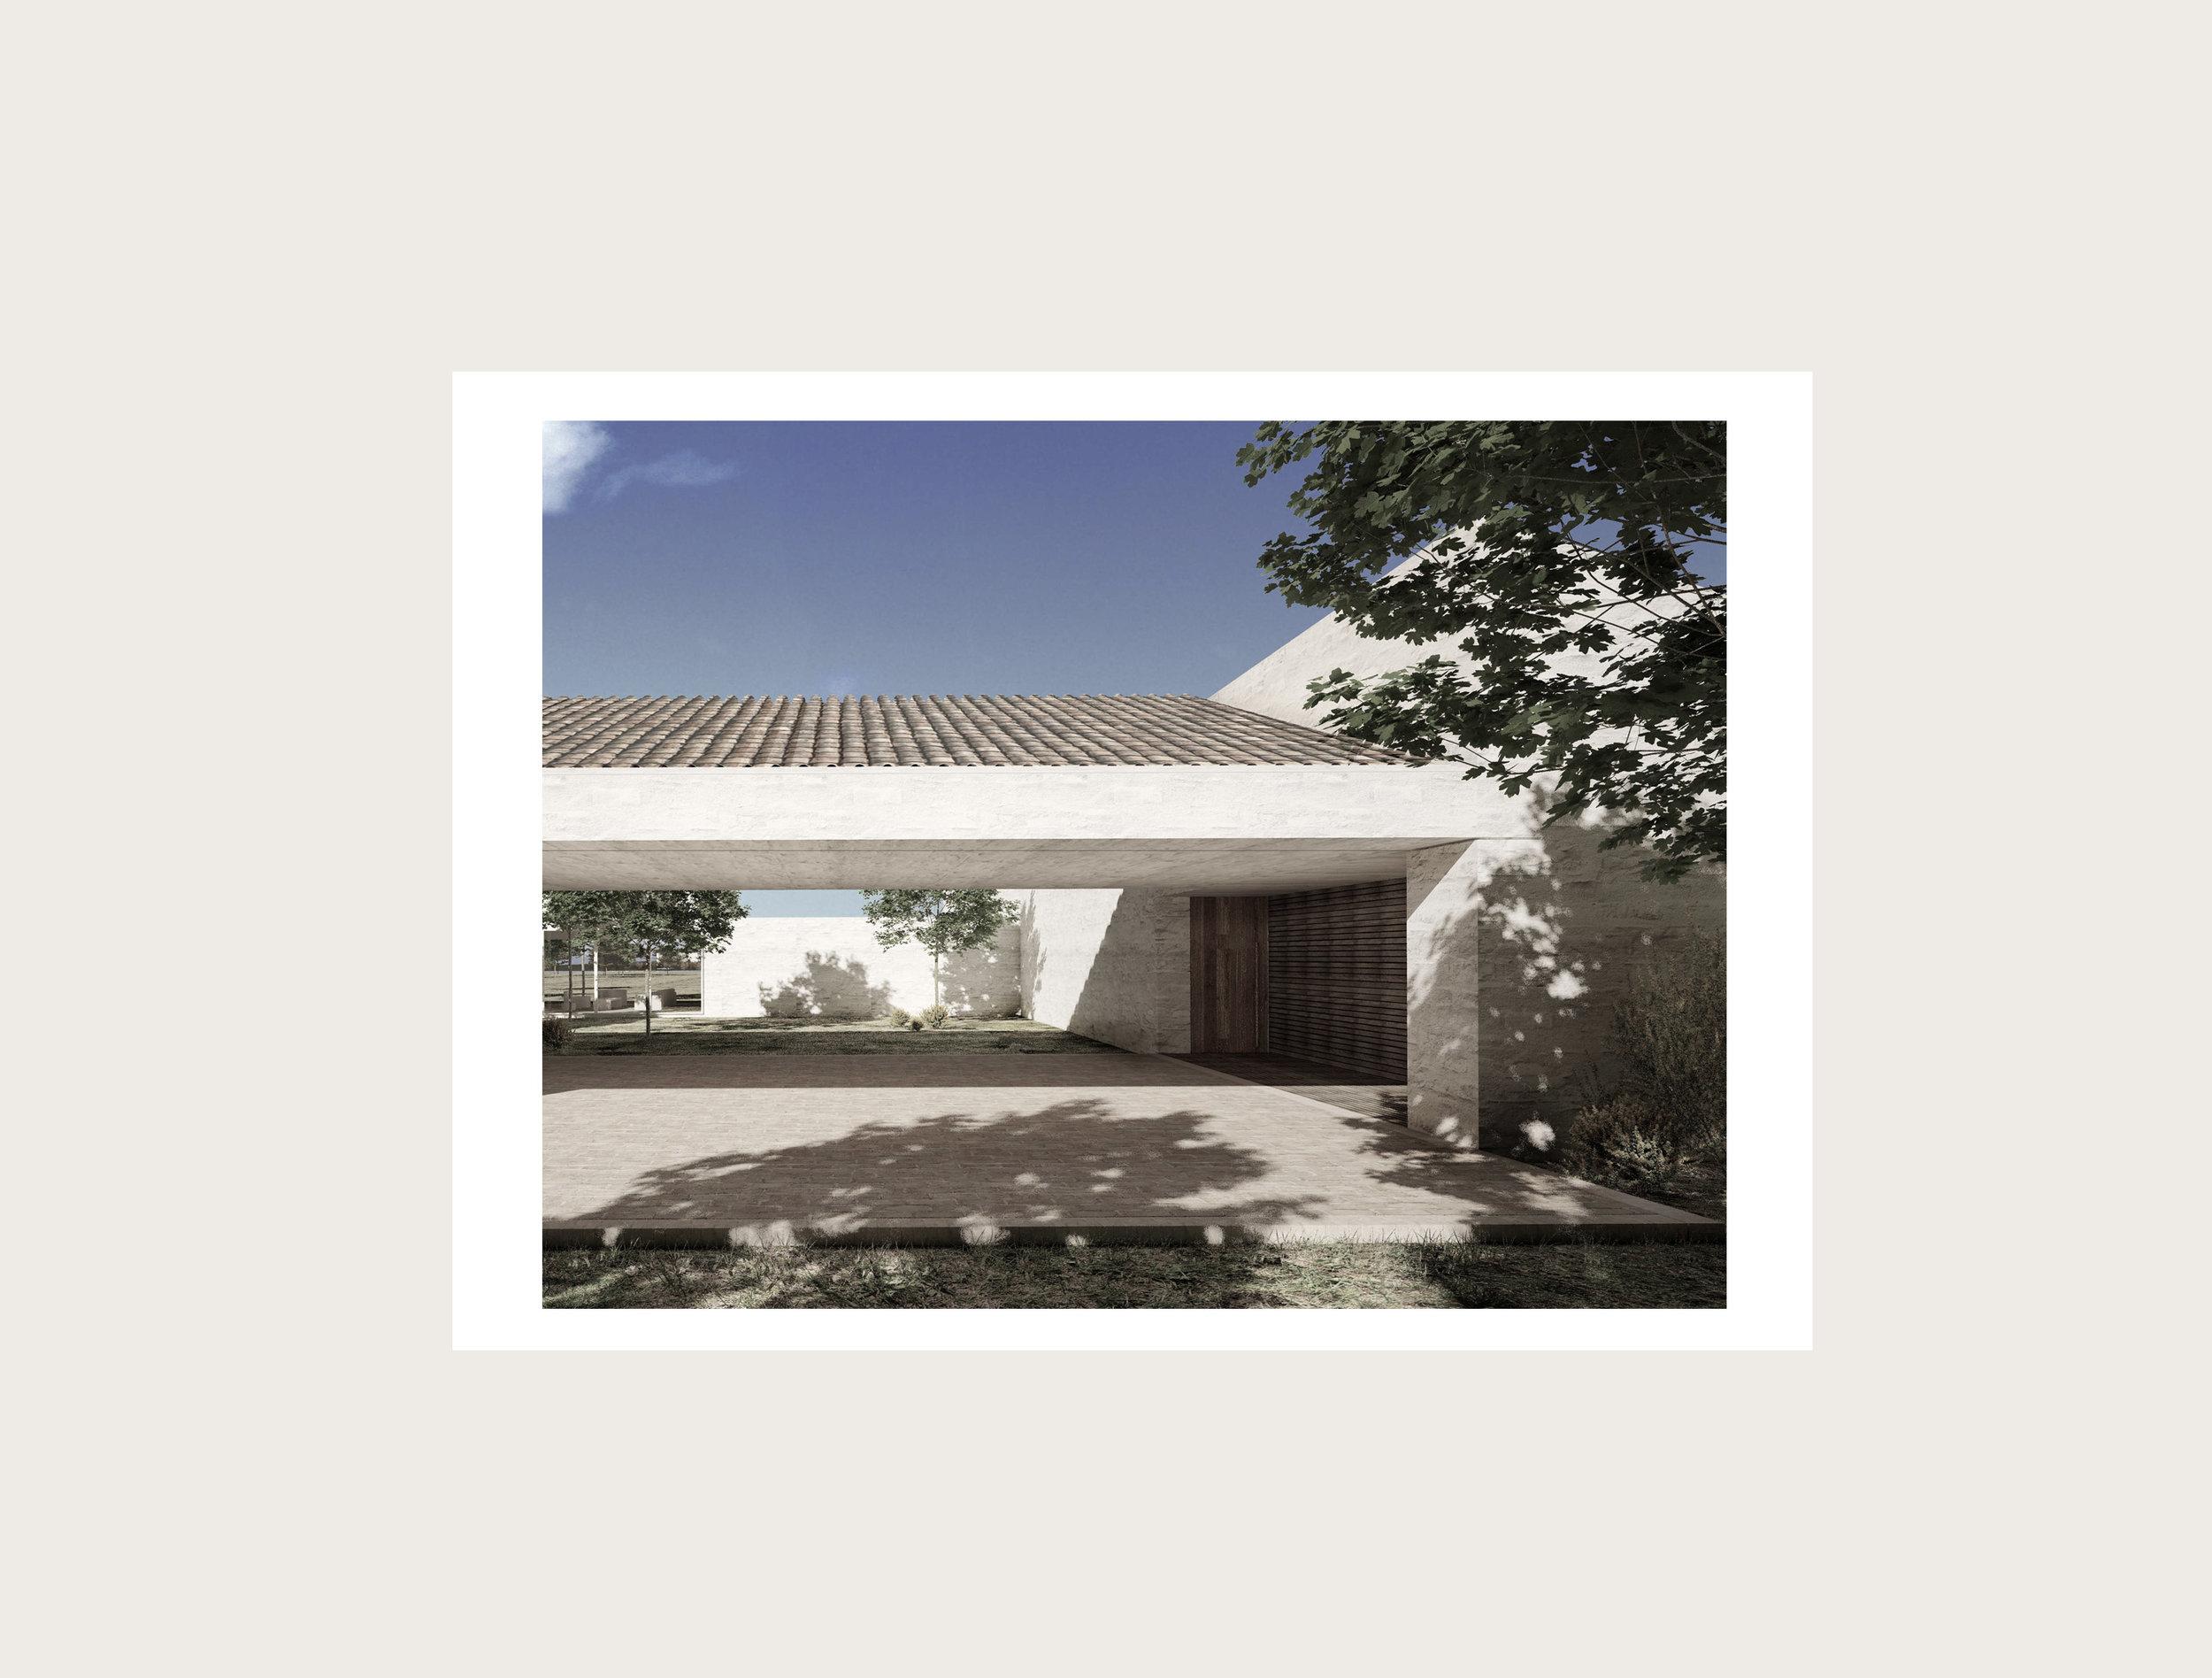 Raams-Architecture-Design-Studio-hrb-house-Spain-rural-housing-ruralretreat-arquitectura-rural-04.jpg